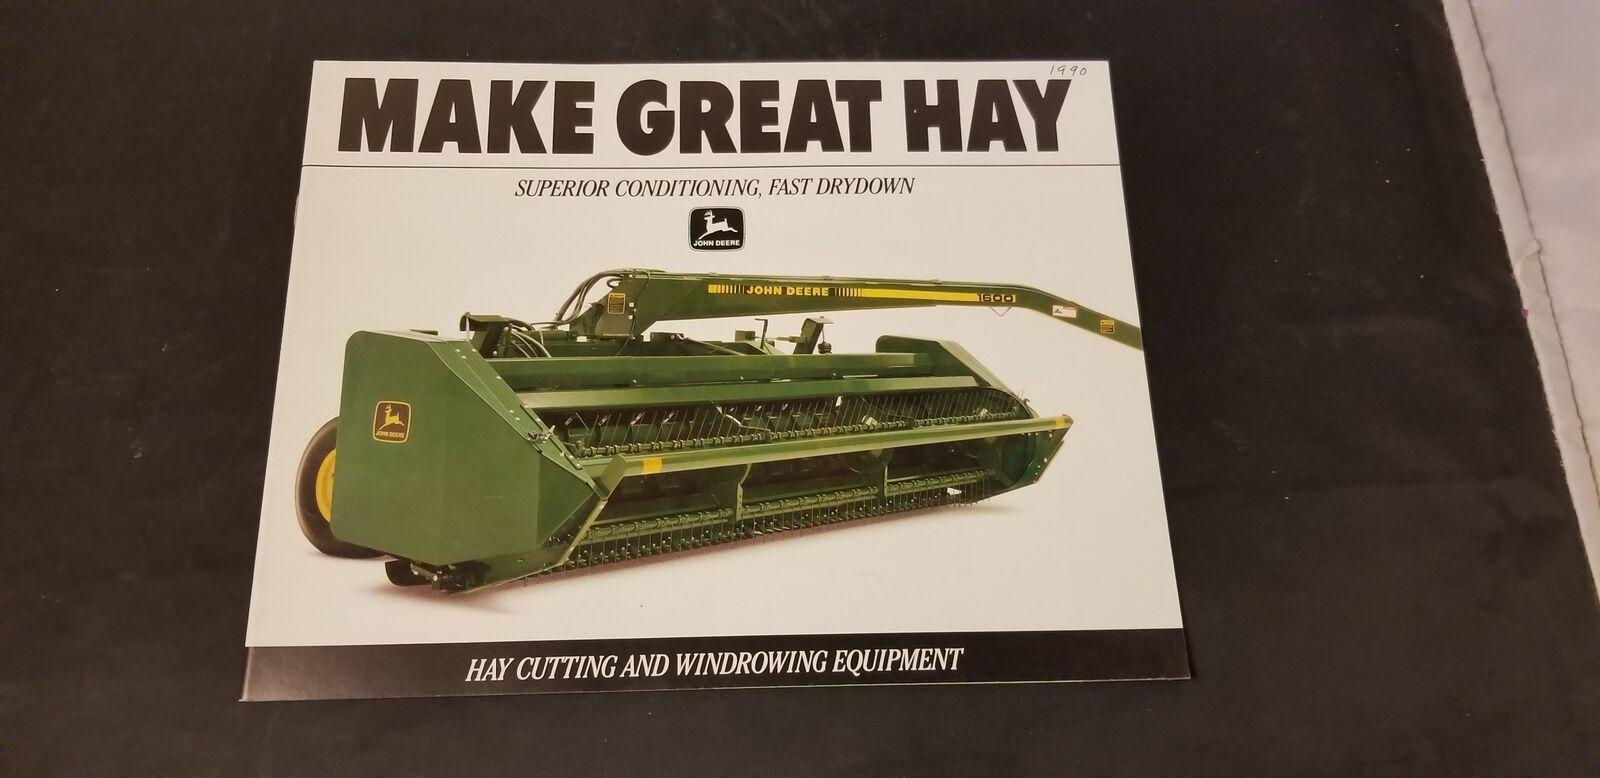 1989 John Deere Hay Cutting & Windrowing Equipment Brochure 3430-3830 & More - $9.62